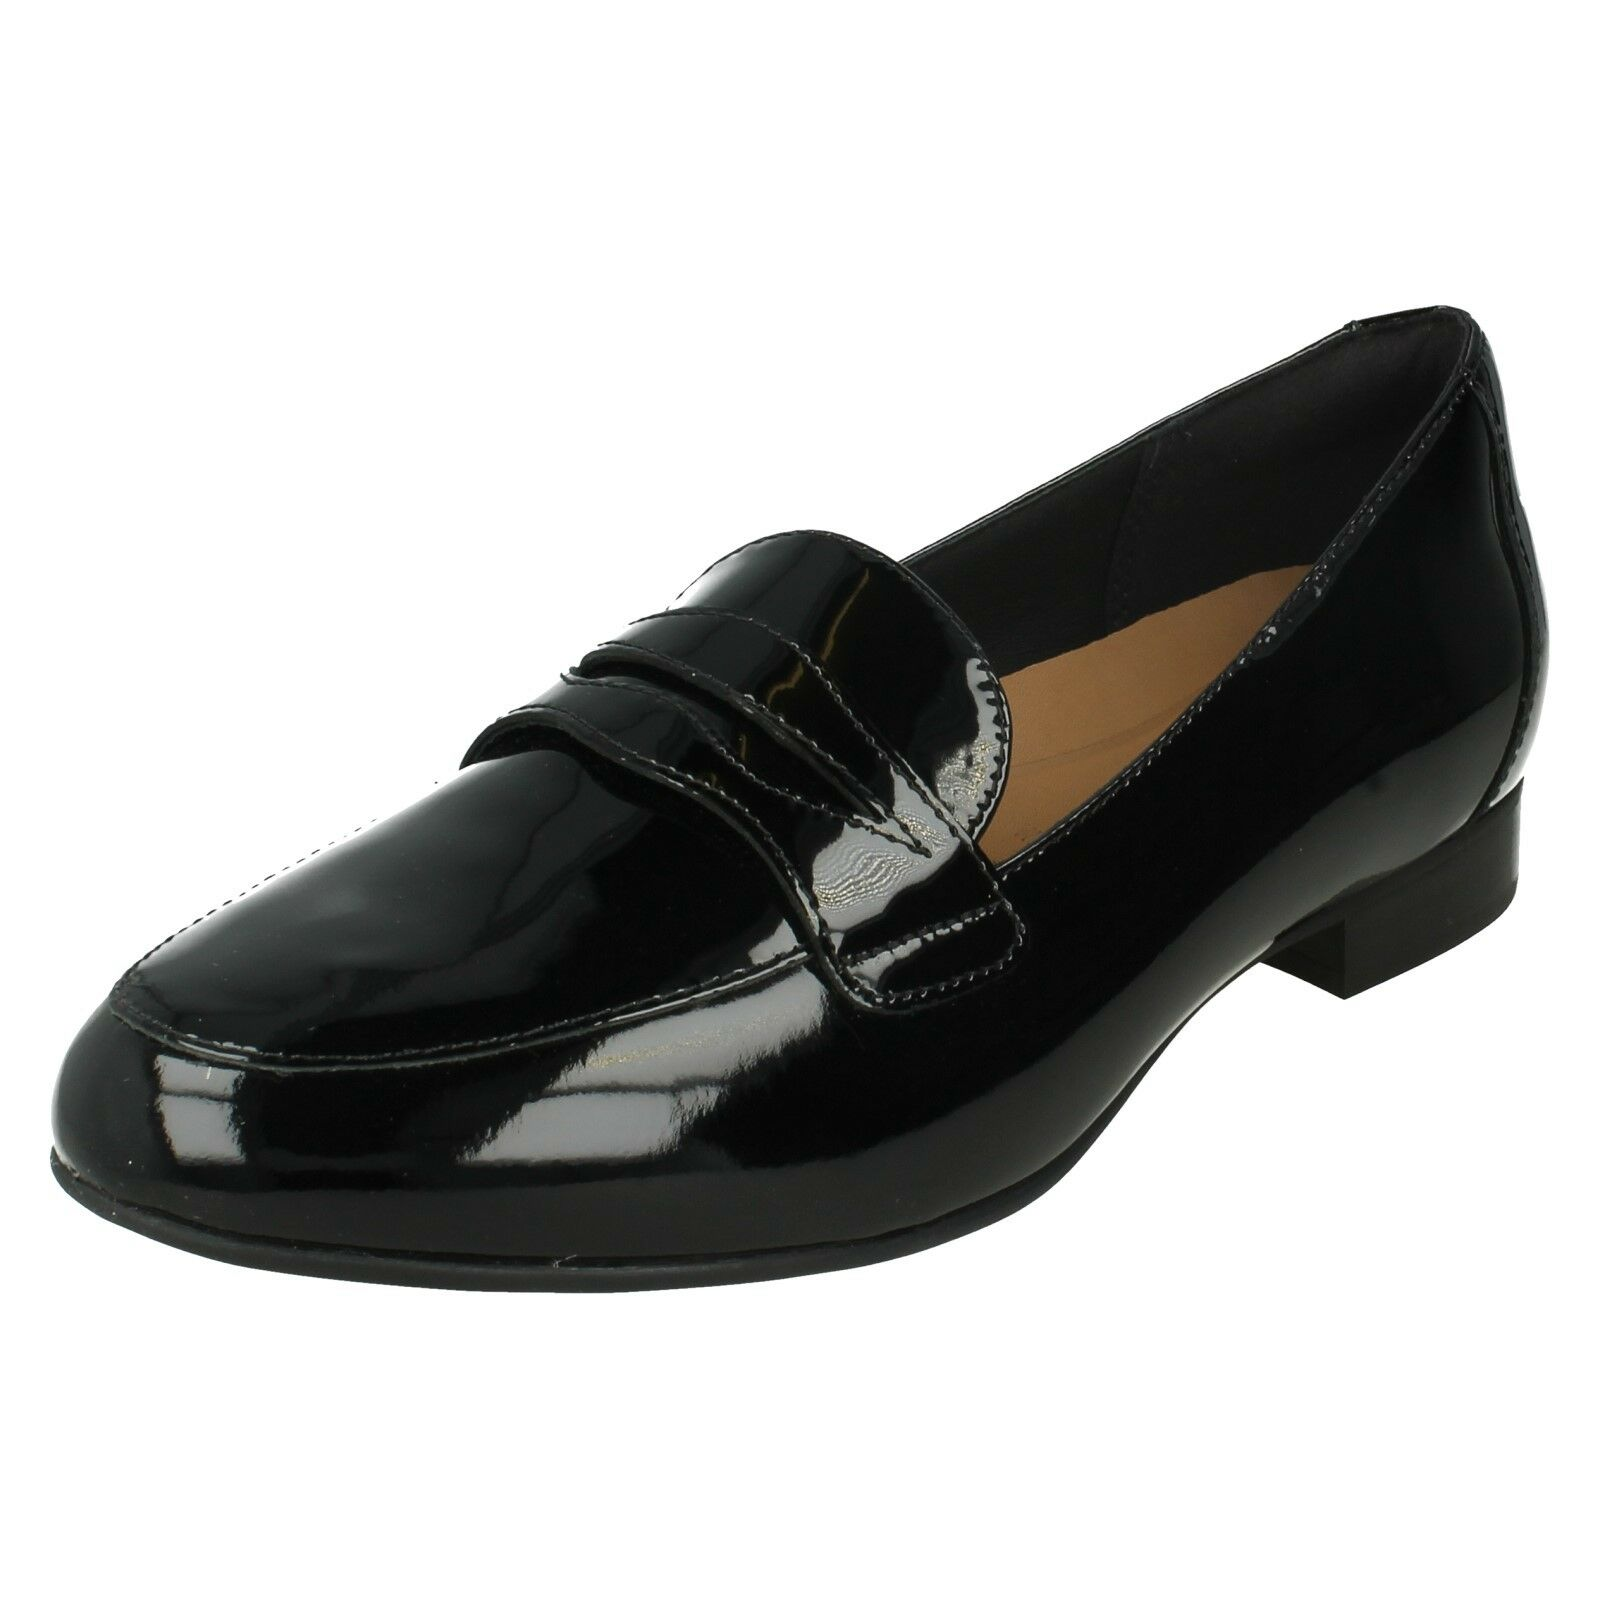 LADIES LADIES LADIES UNSTRUCTUROT CLARKS PATENT SMART CASUAL LOAFERS Schuhe SIZE UN BLUSH GO e38a5b